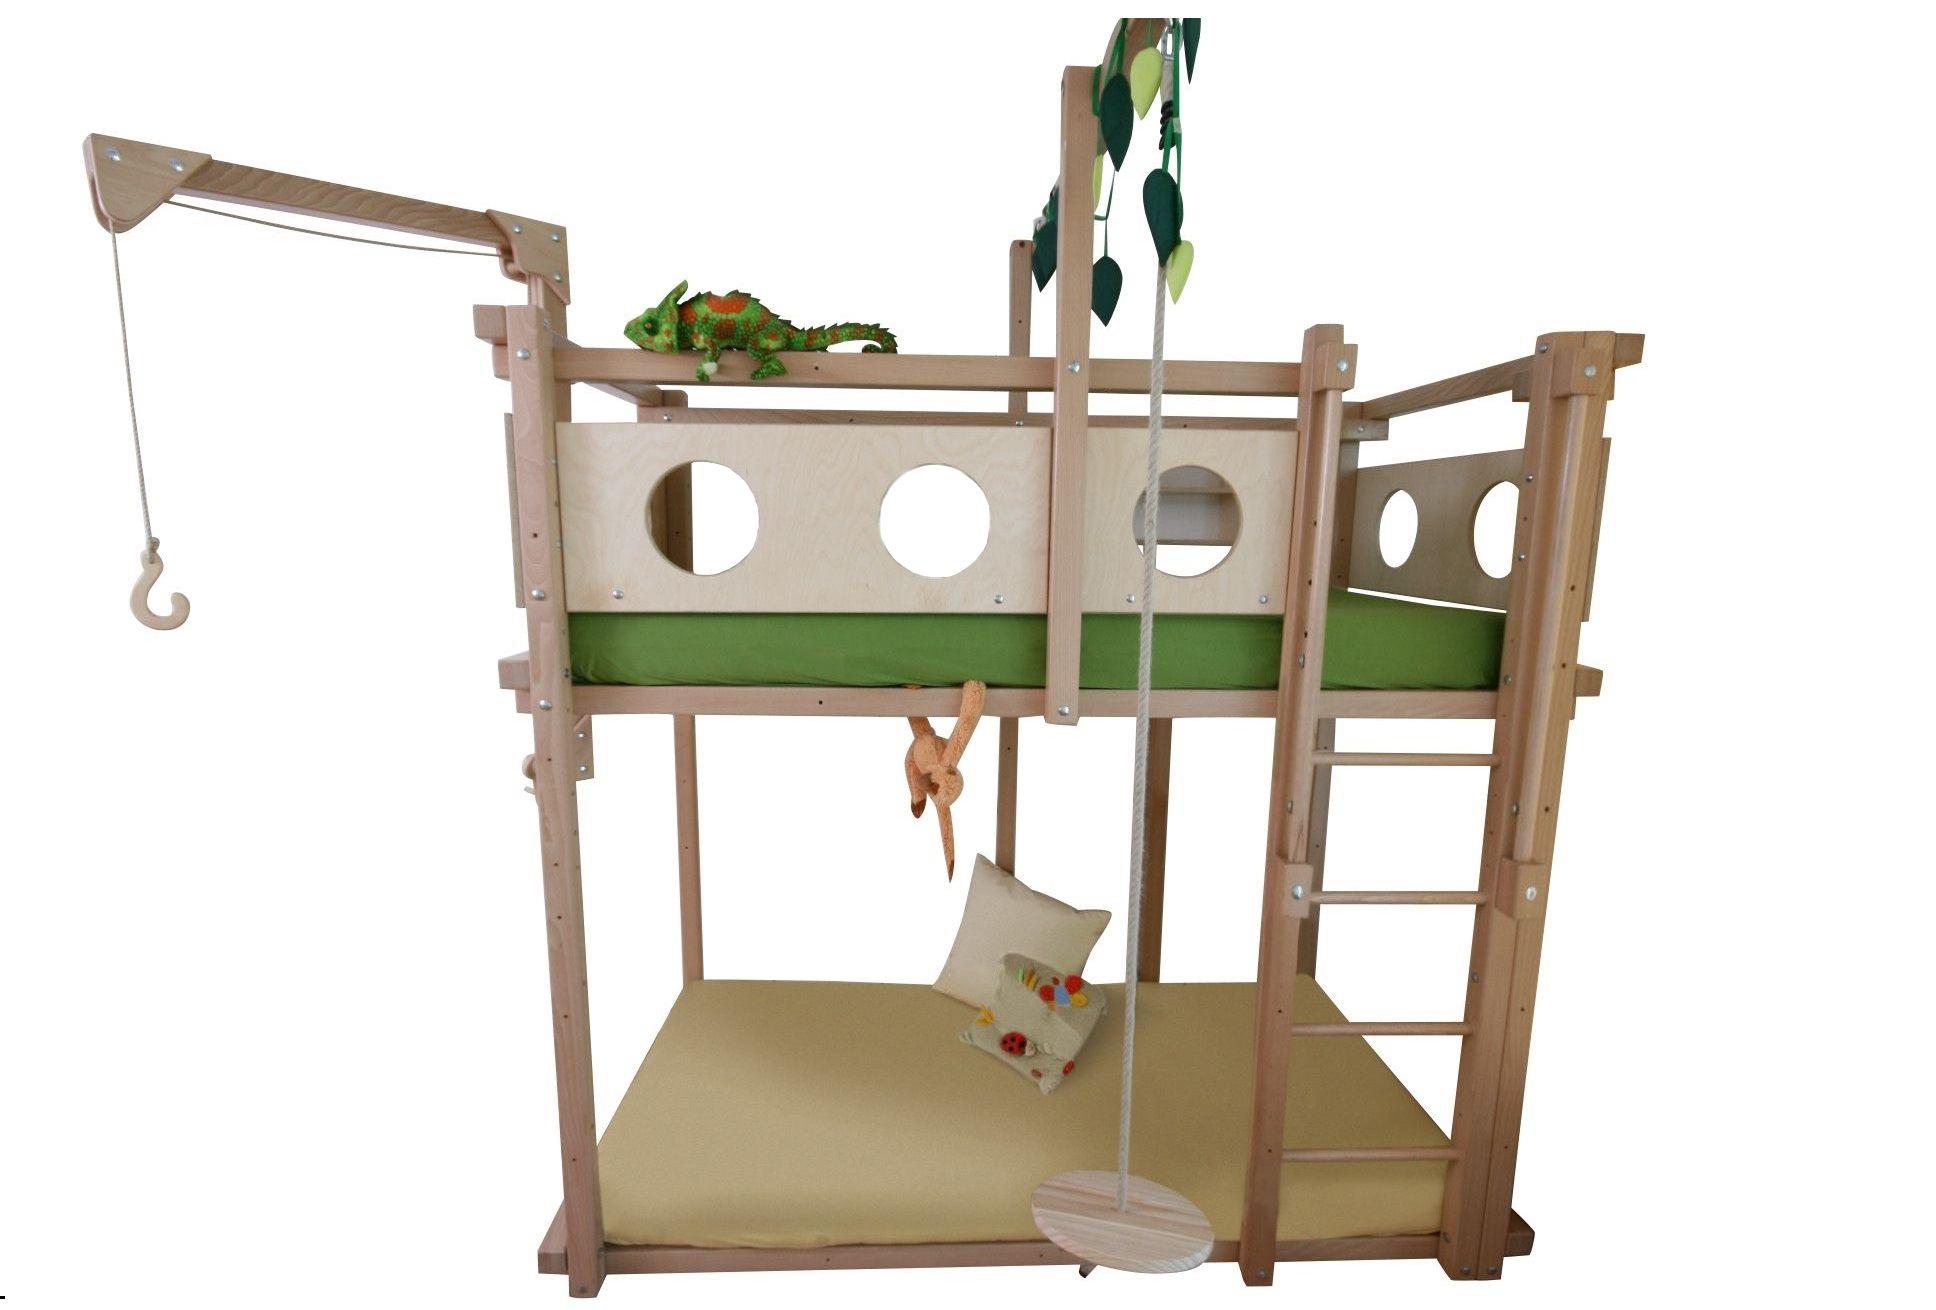 hochbett mit spielbett oli niki. Black Bedroom Furniture Sets. Home Design Ideas